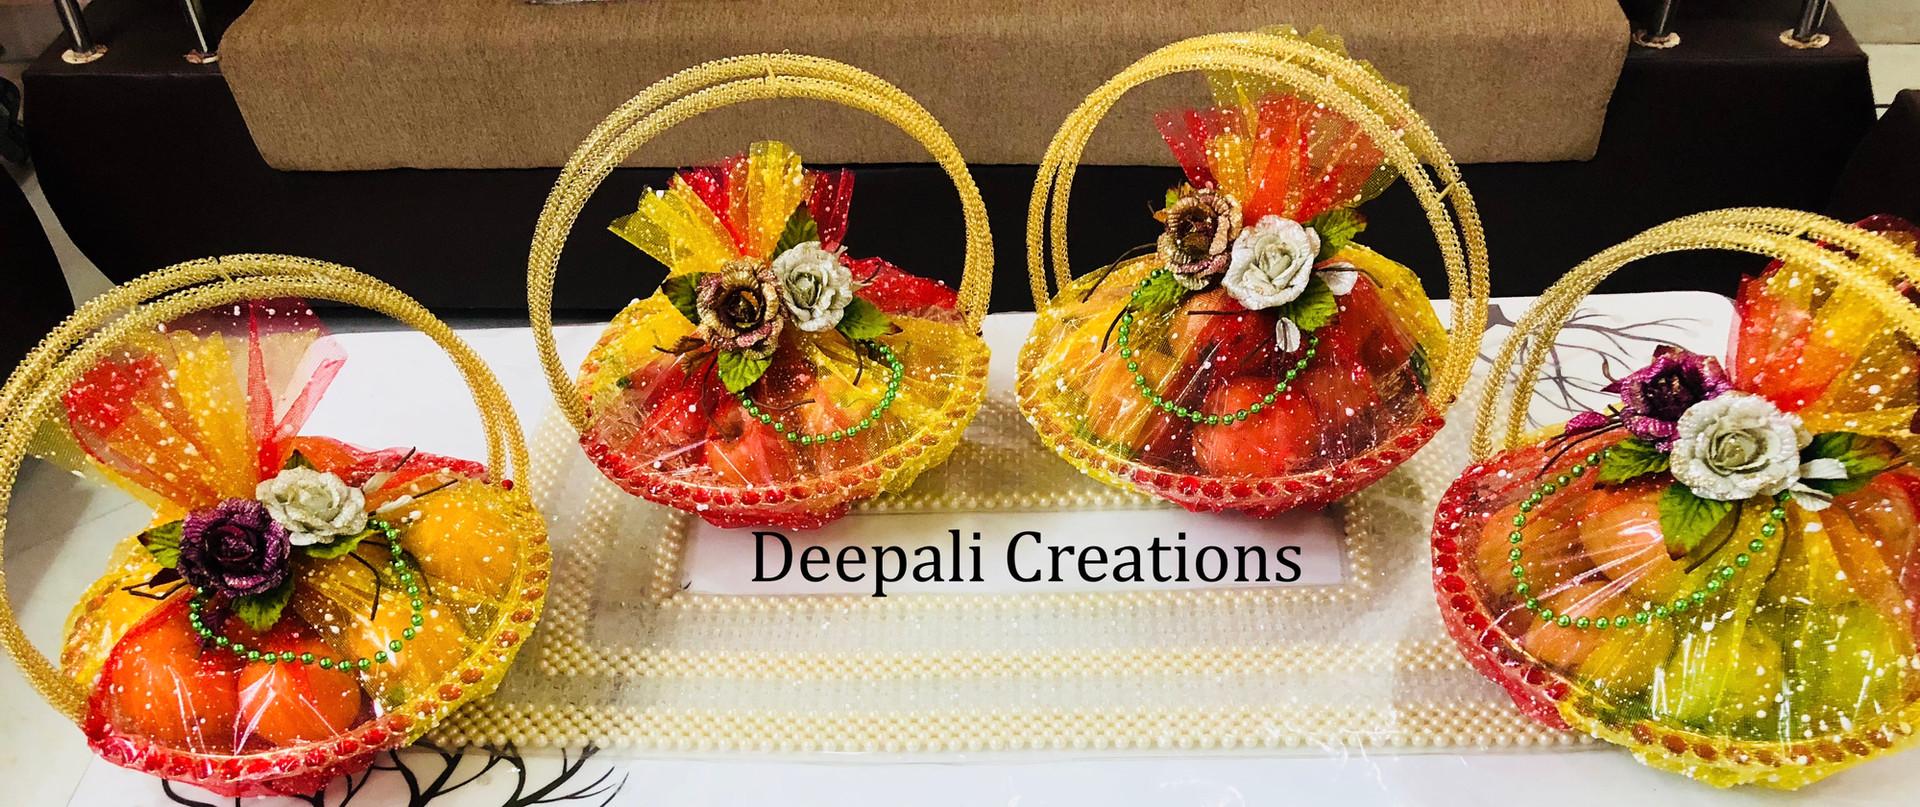 Fruit Baskets By Deepali Creations